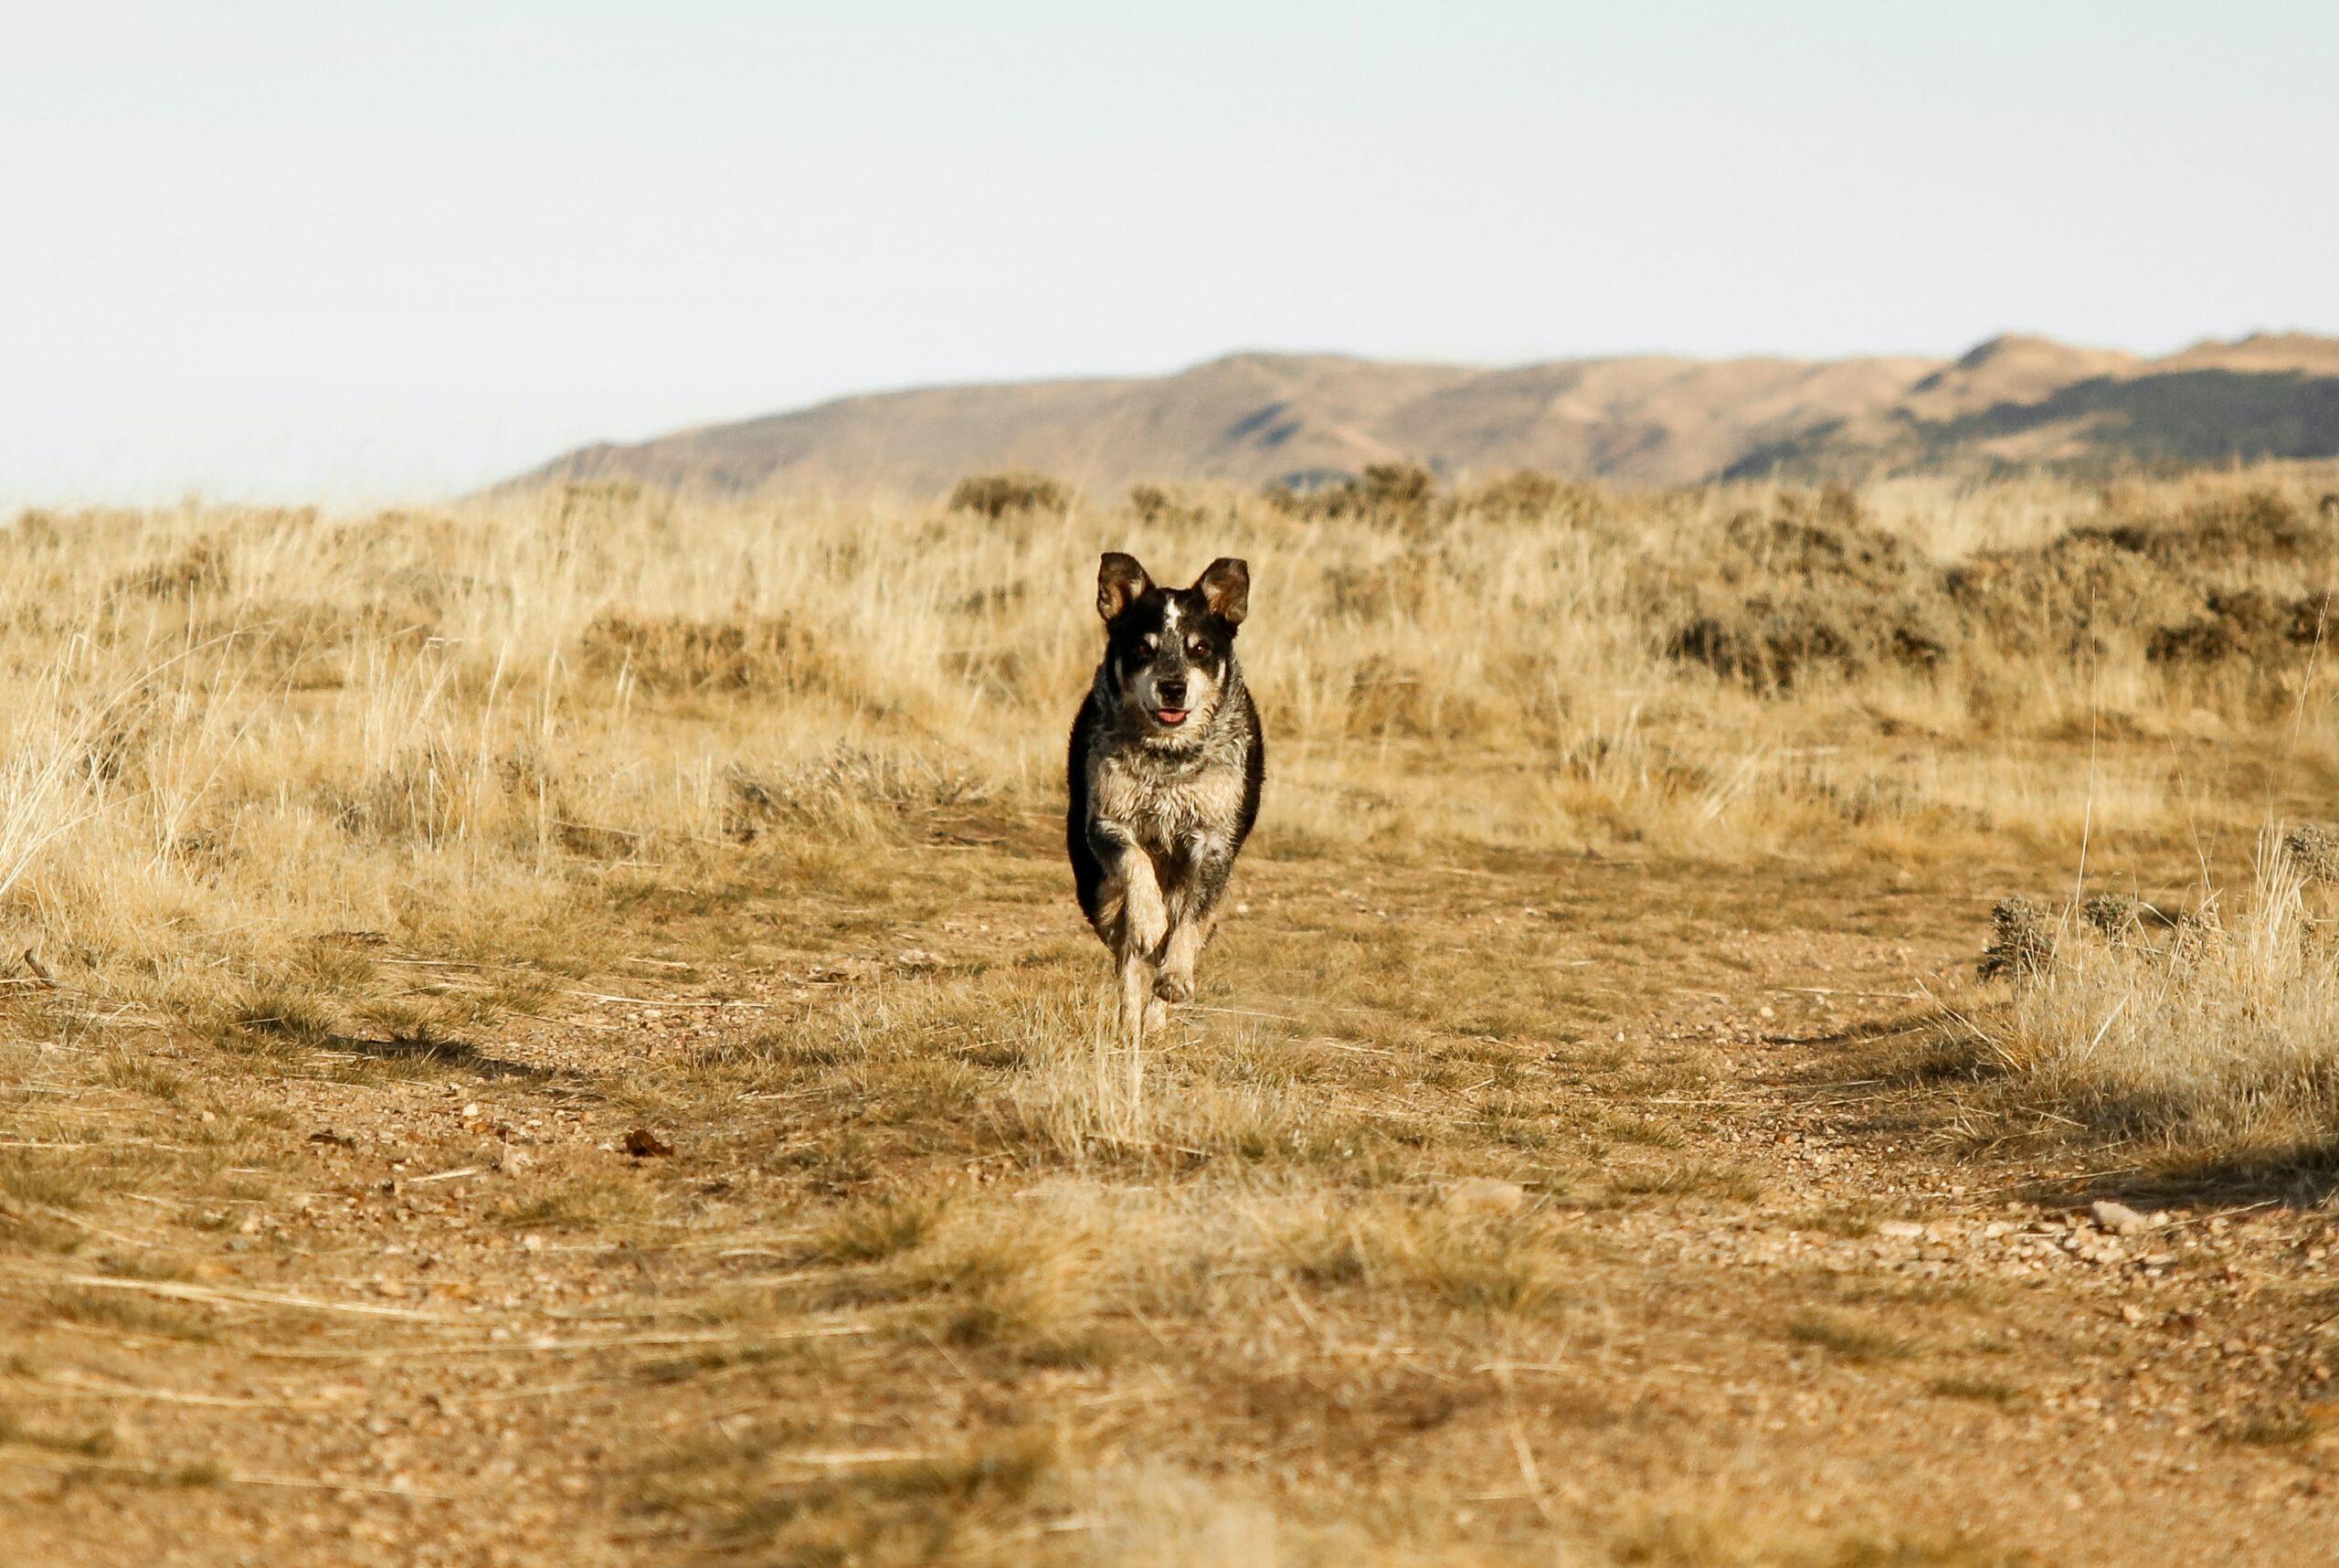 patrick-hendry-border collie small mut in mountain field full run-unsplash